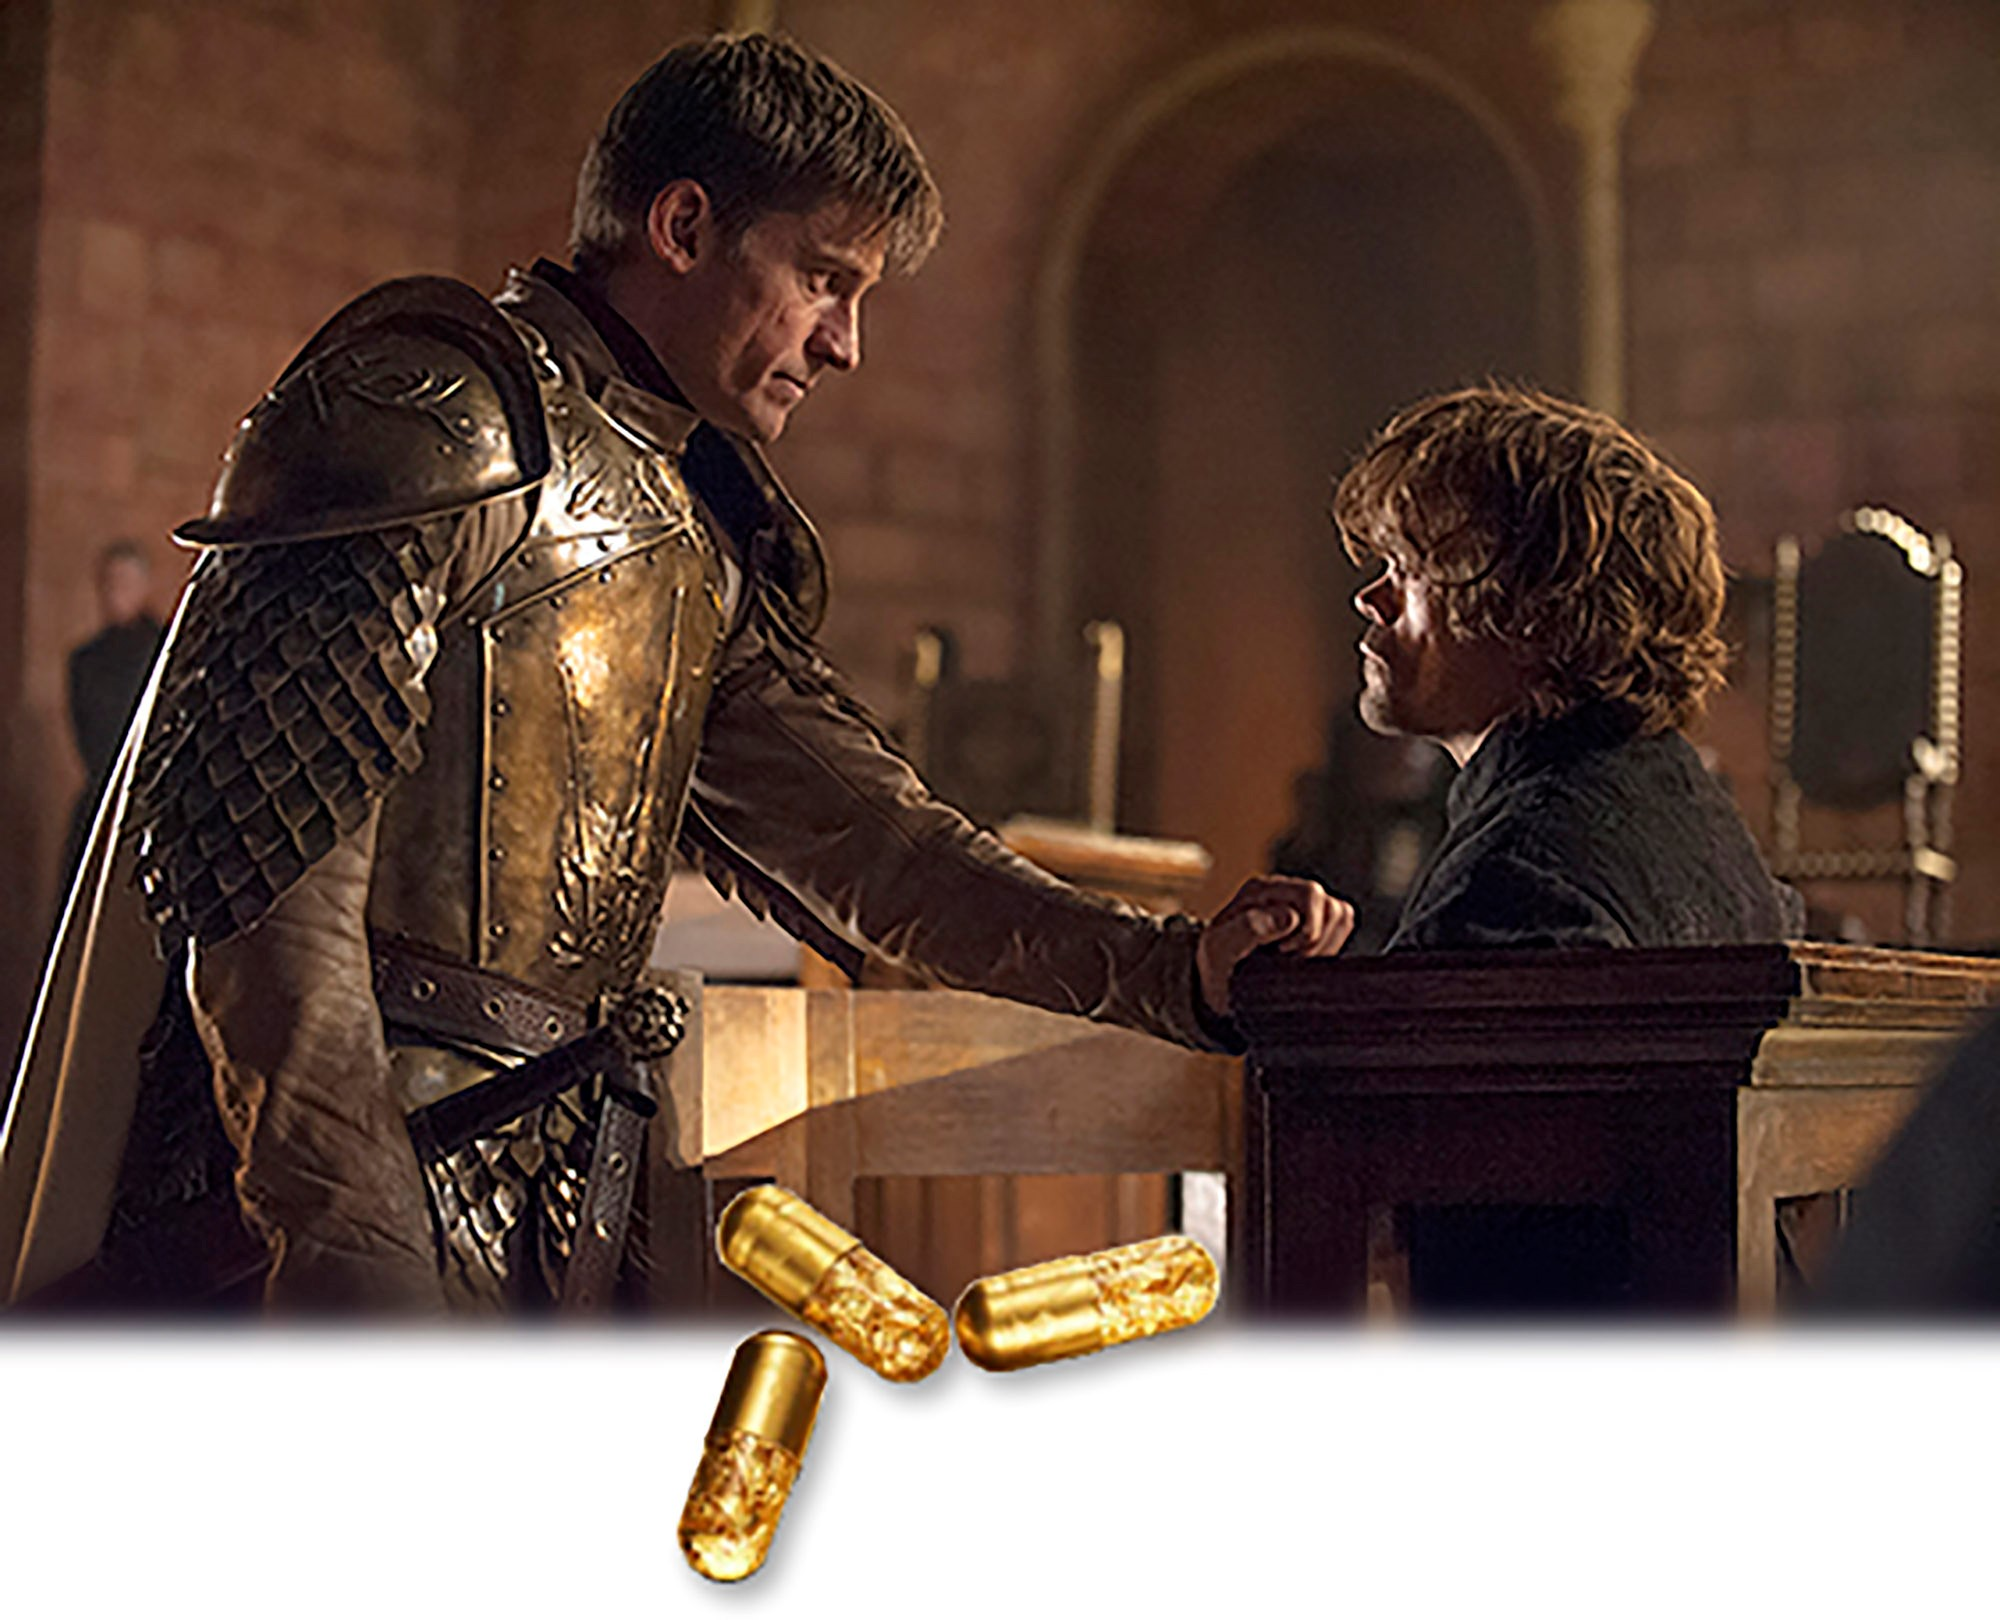 Original image: HBO